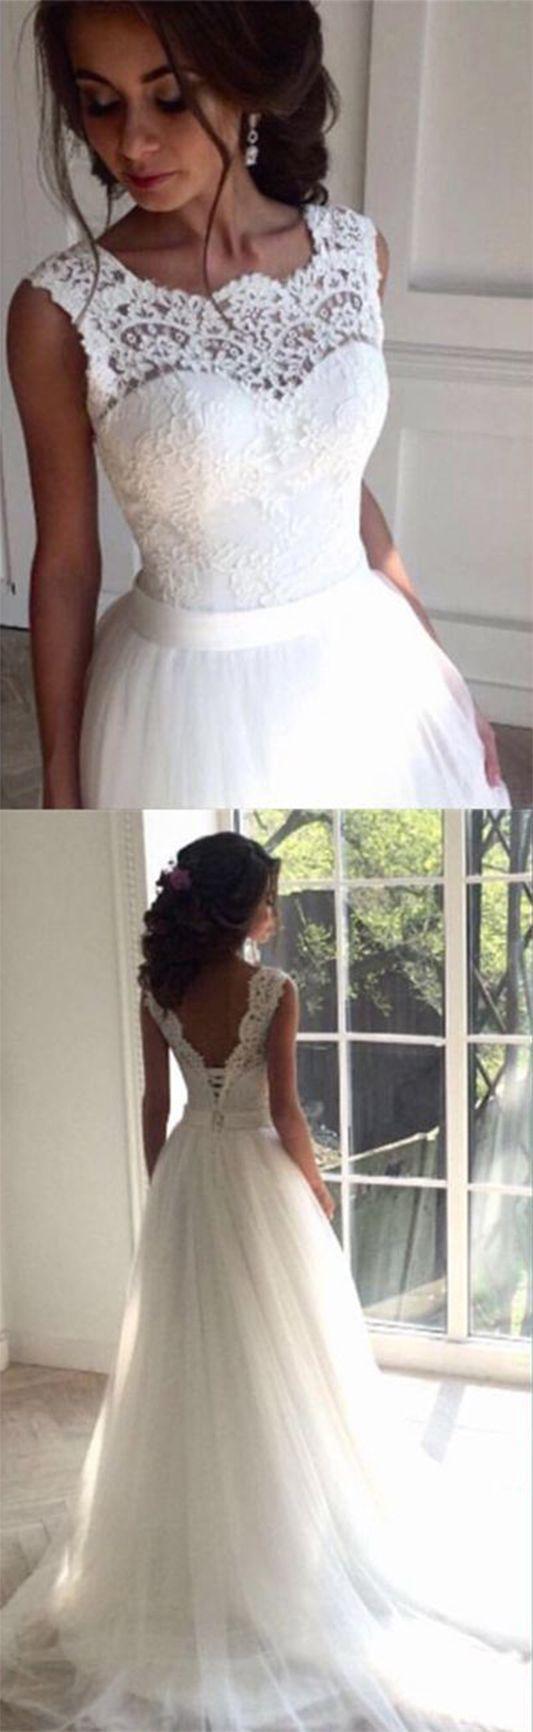 Simple Wedding Dress,Charming wedding dress, lace wedding dress ...